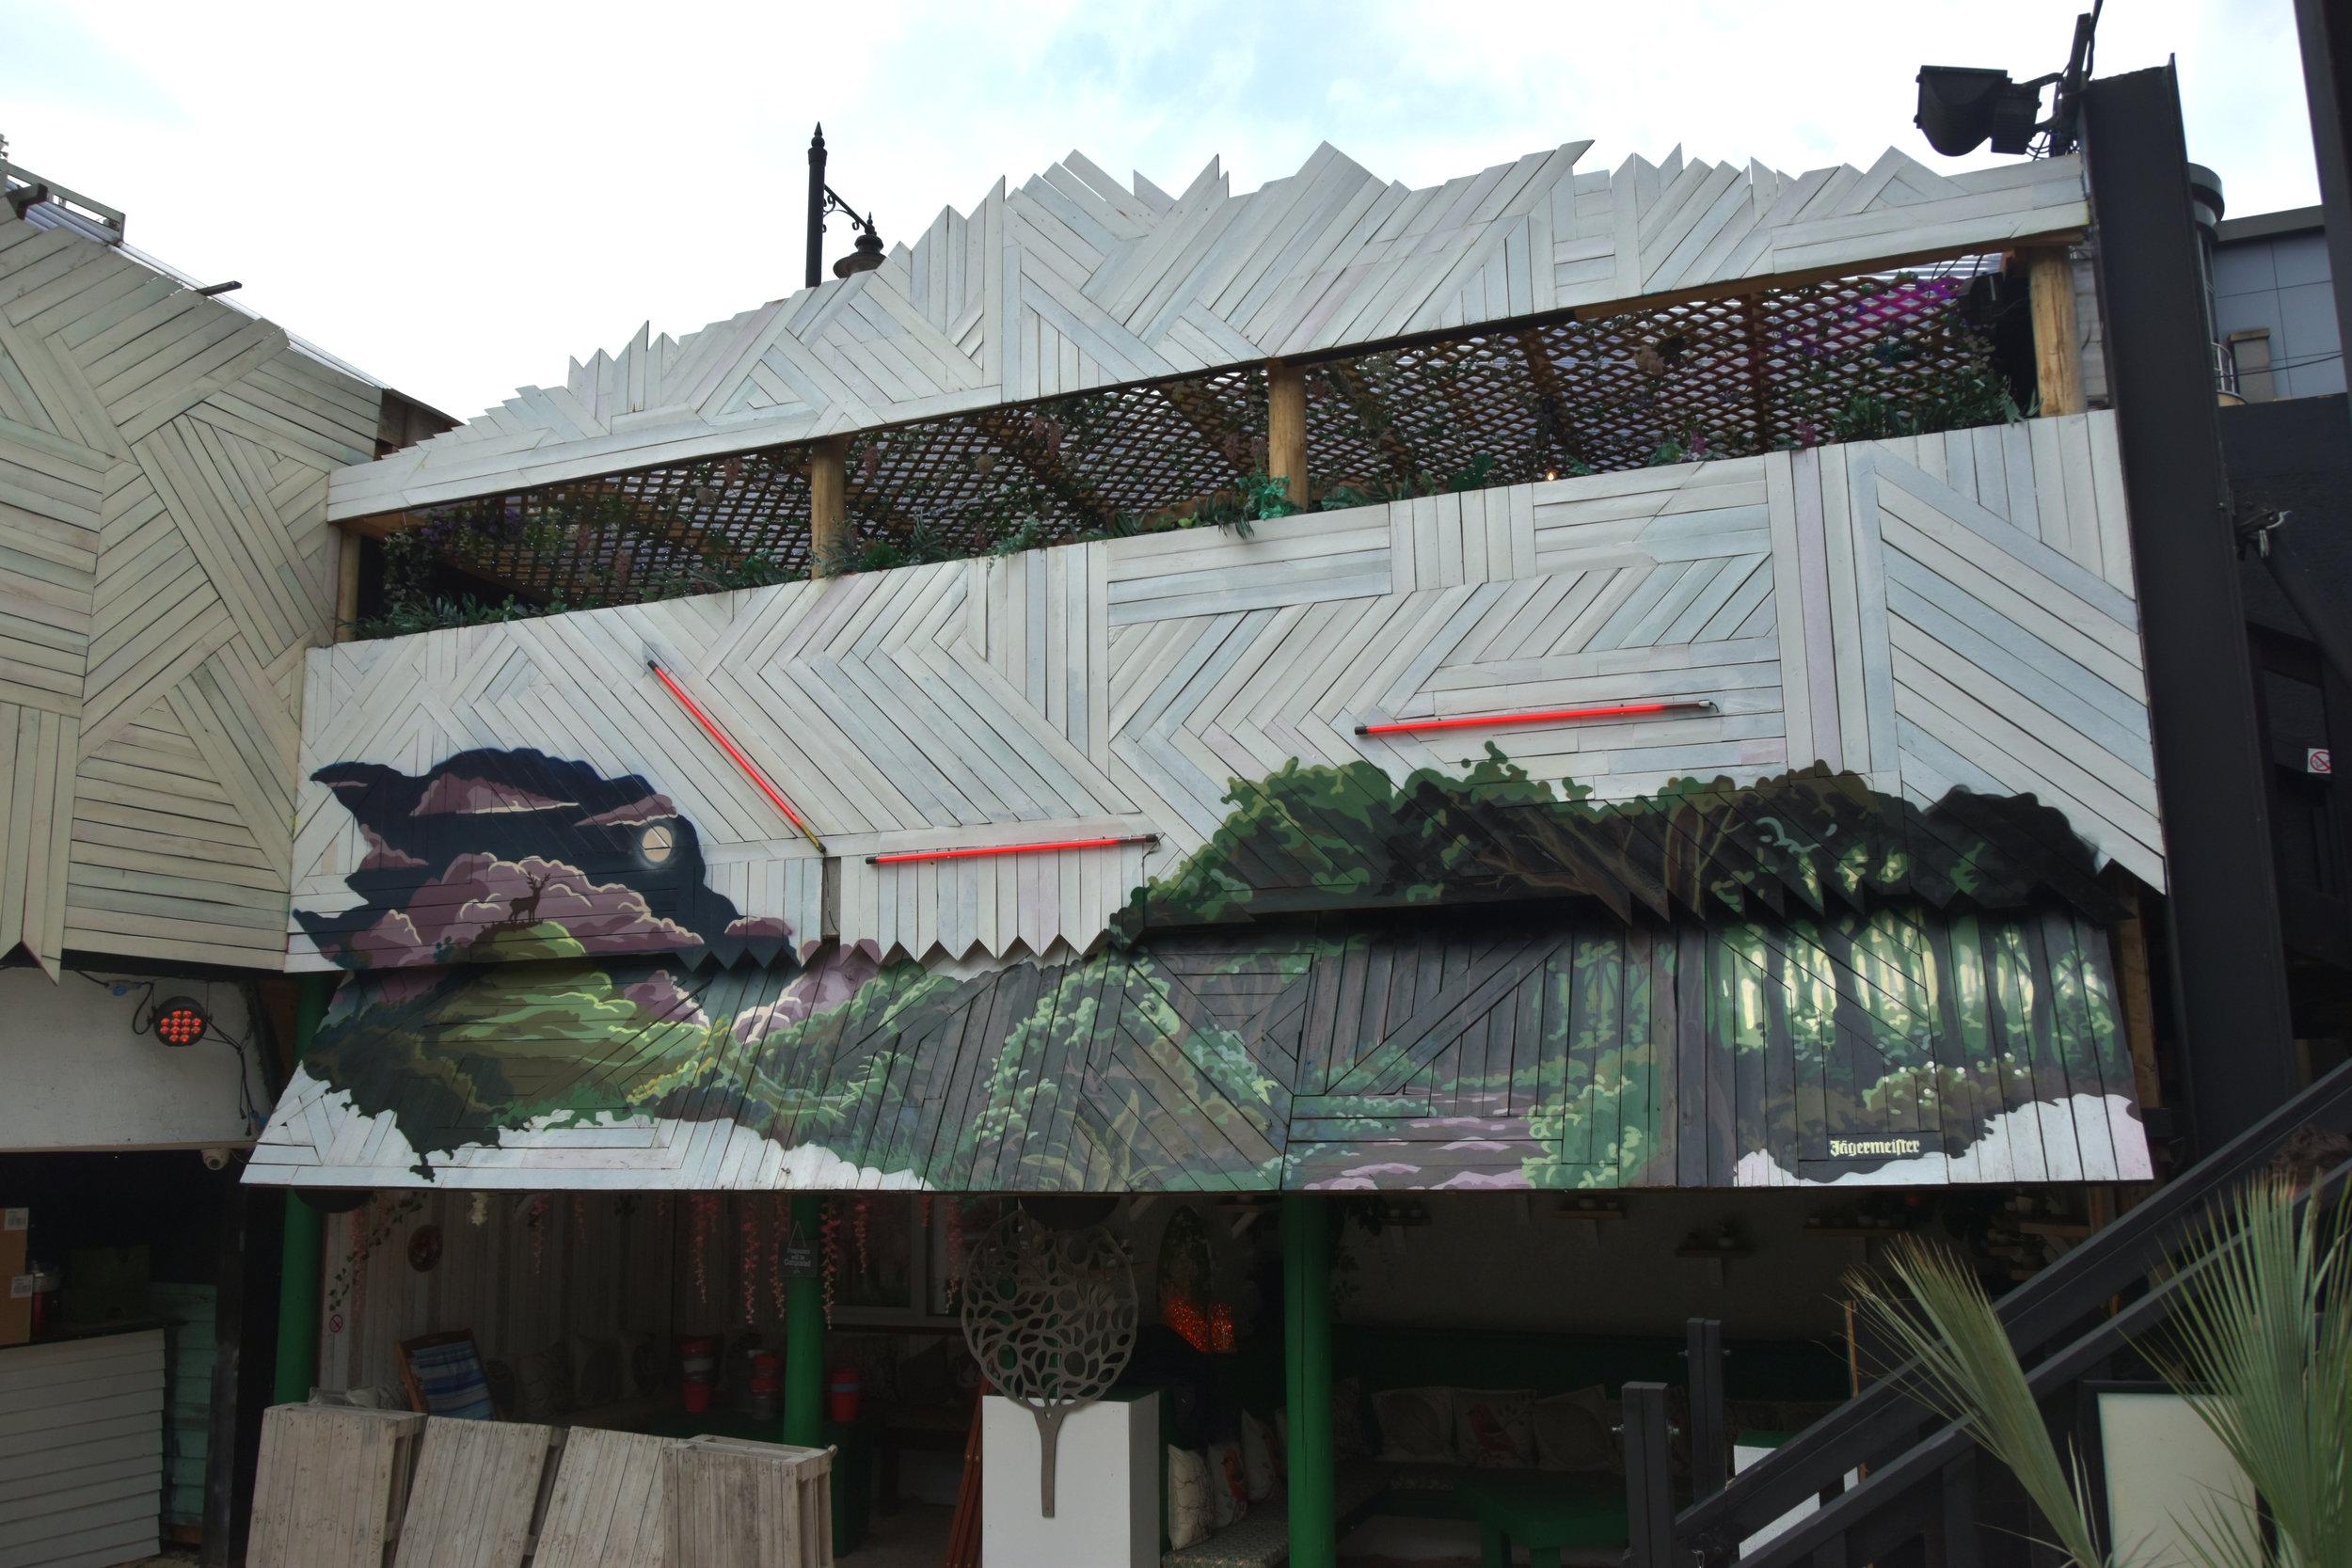 Jagermeister mural, Last Days of Shoreditch #2.jpg